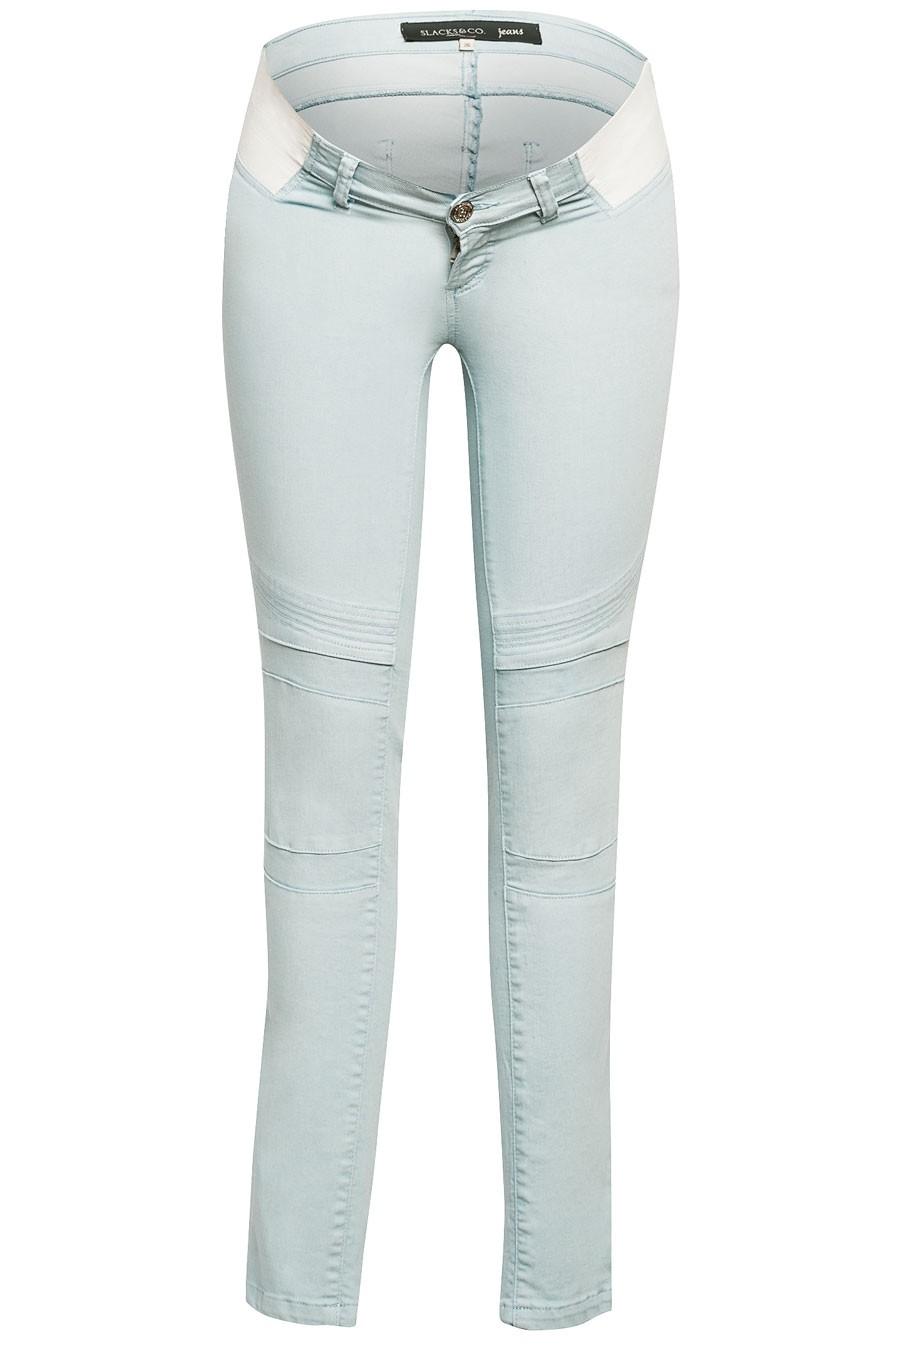 HARLEY Biker Jeans